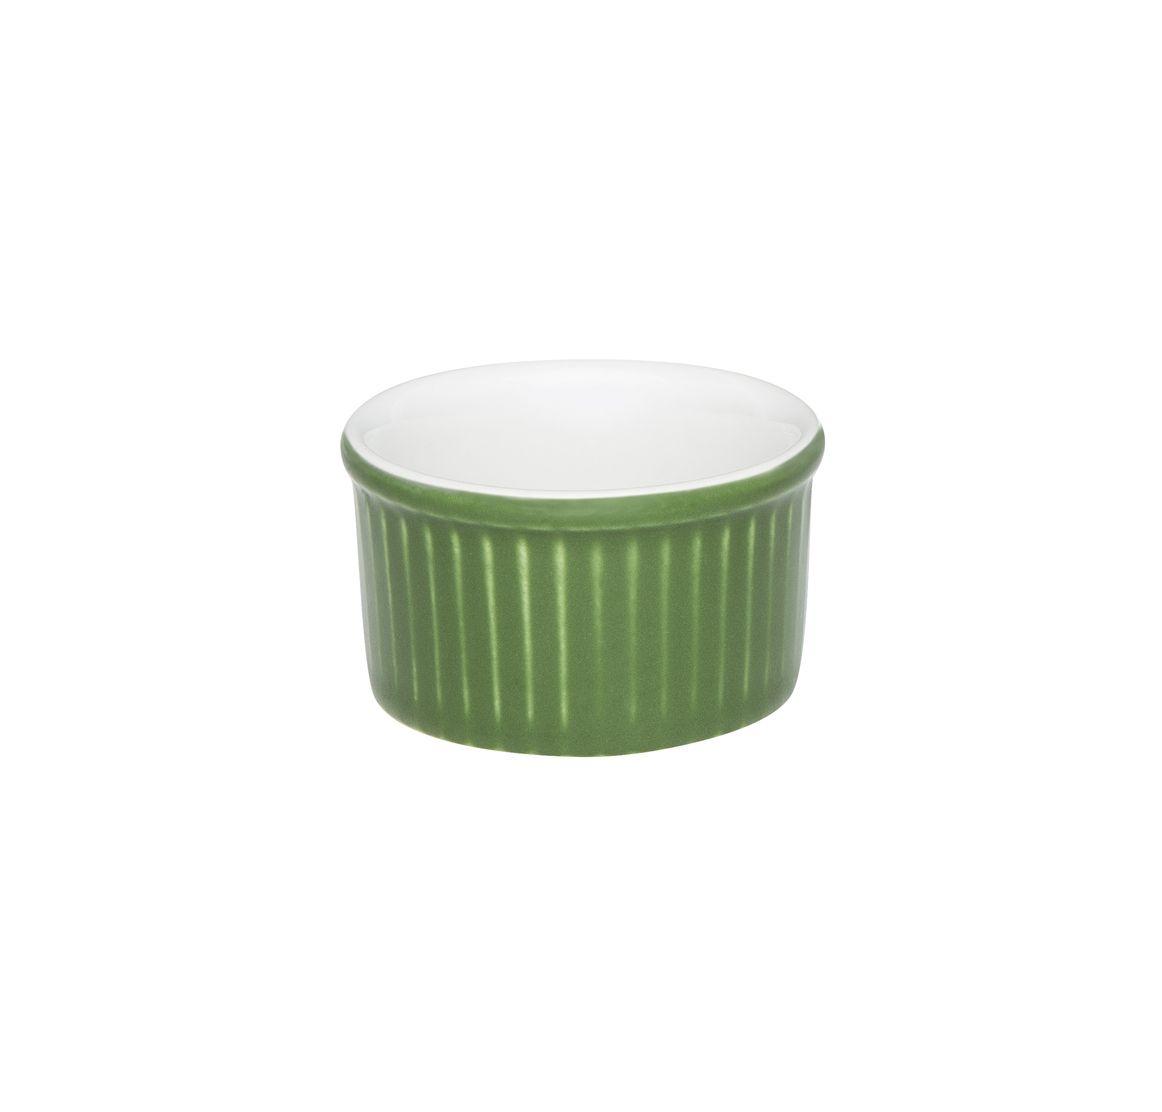 Tigela Ramequin 6X3Cm 50Ml - Branco/Verde - Oxford Cookware